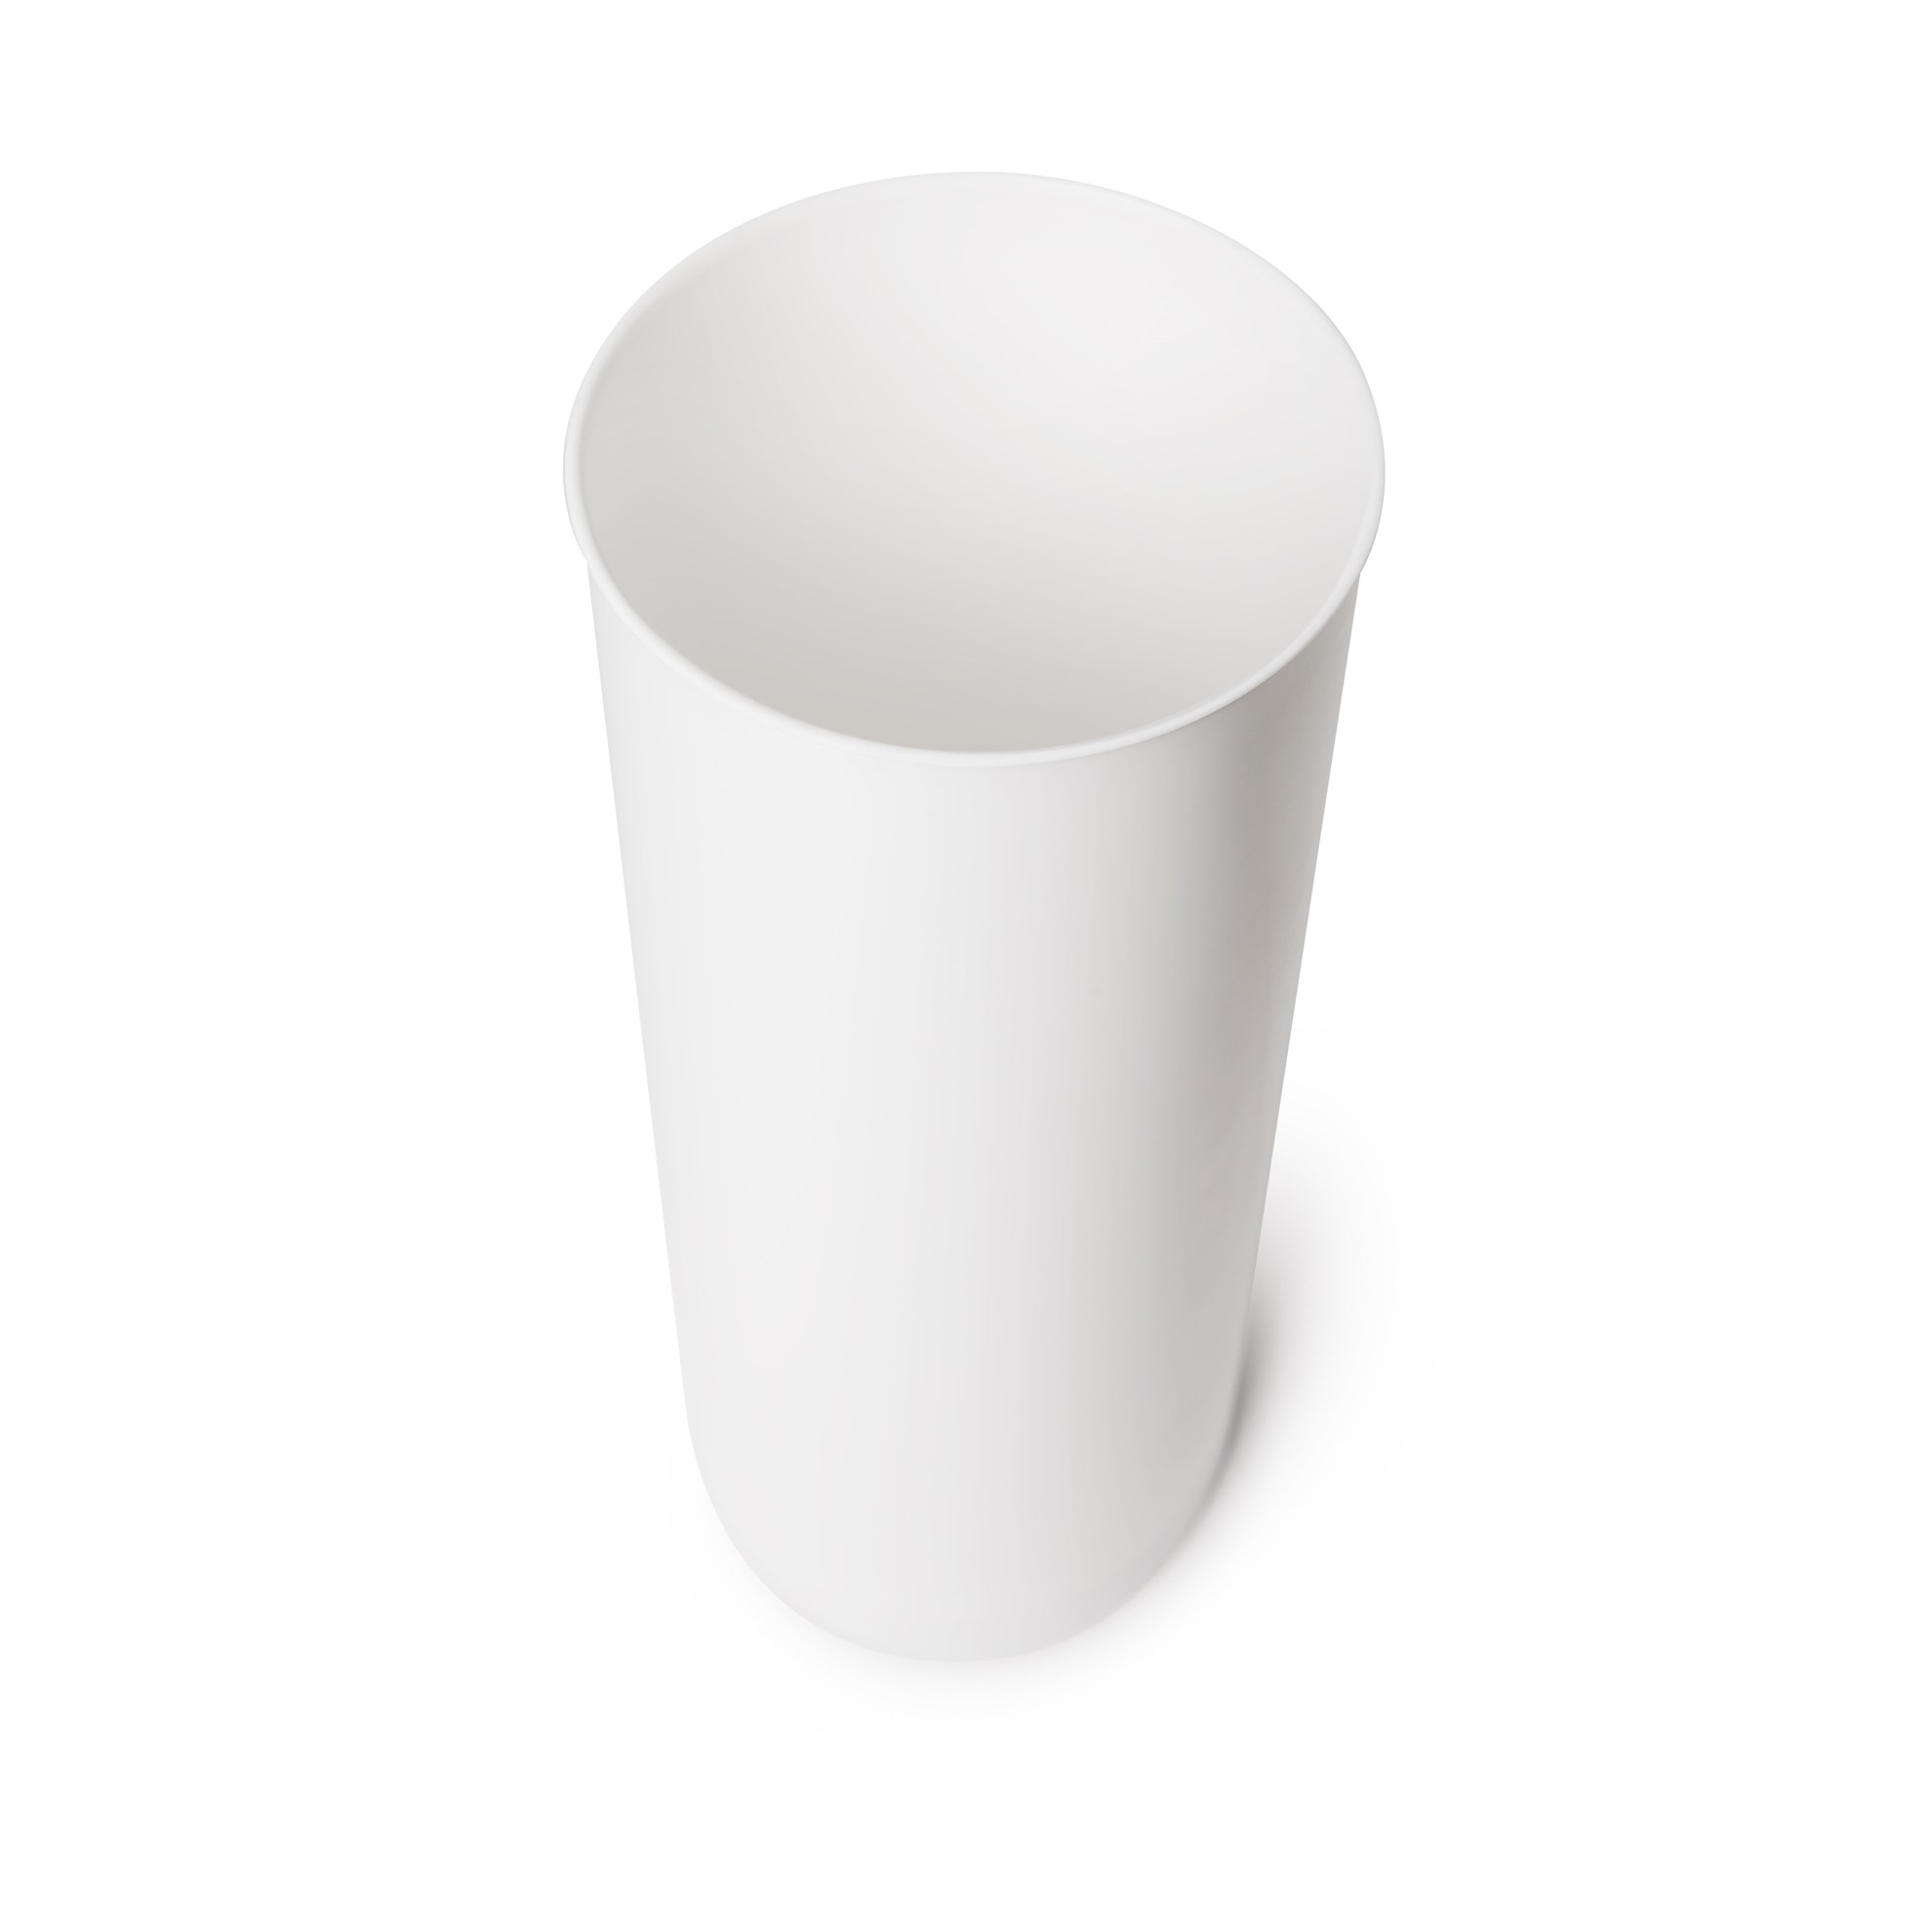 Držák na toaletní papír PORTALOO - bílá/nikl_4